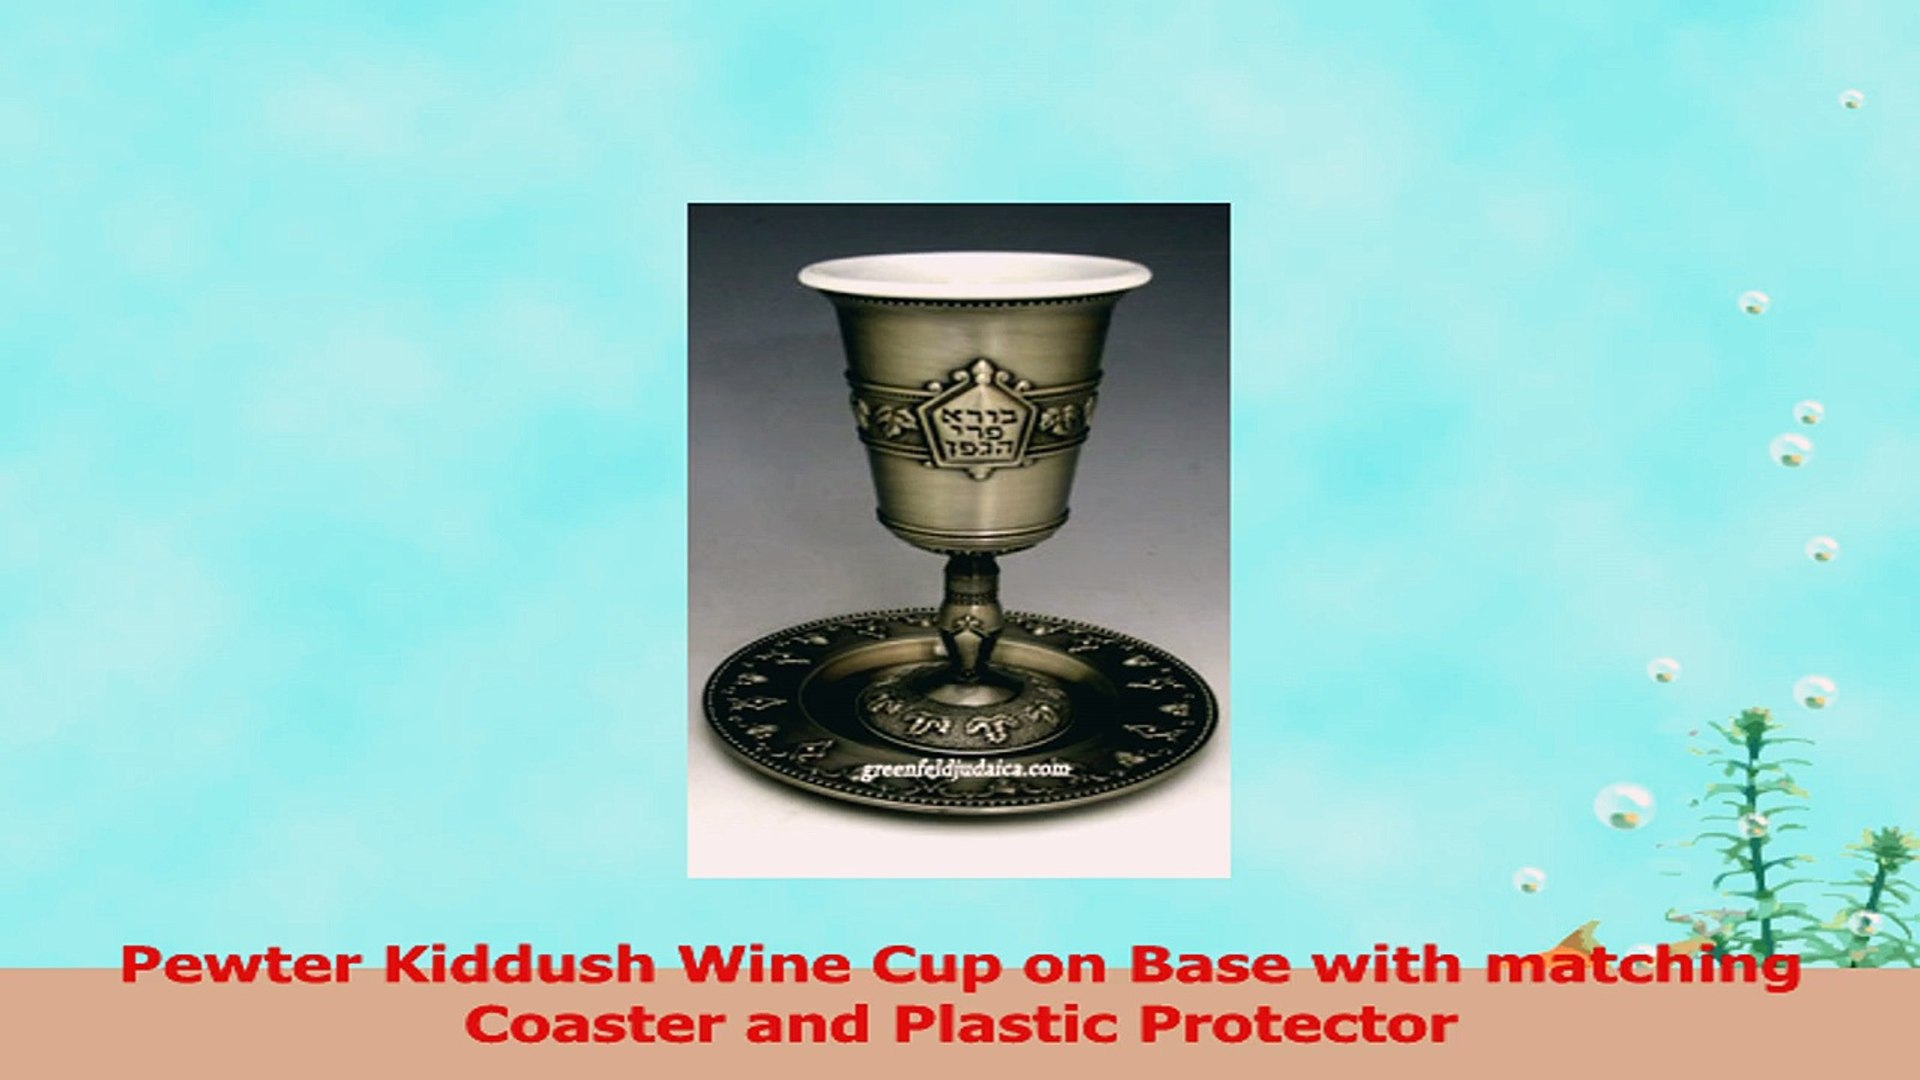 alpha-grp.co.jp Glassware & Drinkware Kitchen & Dining Pewter ...